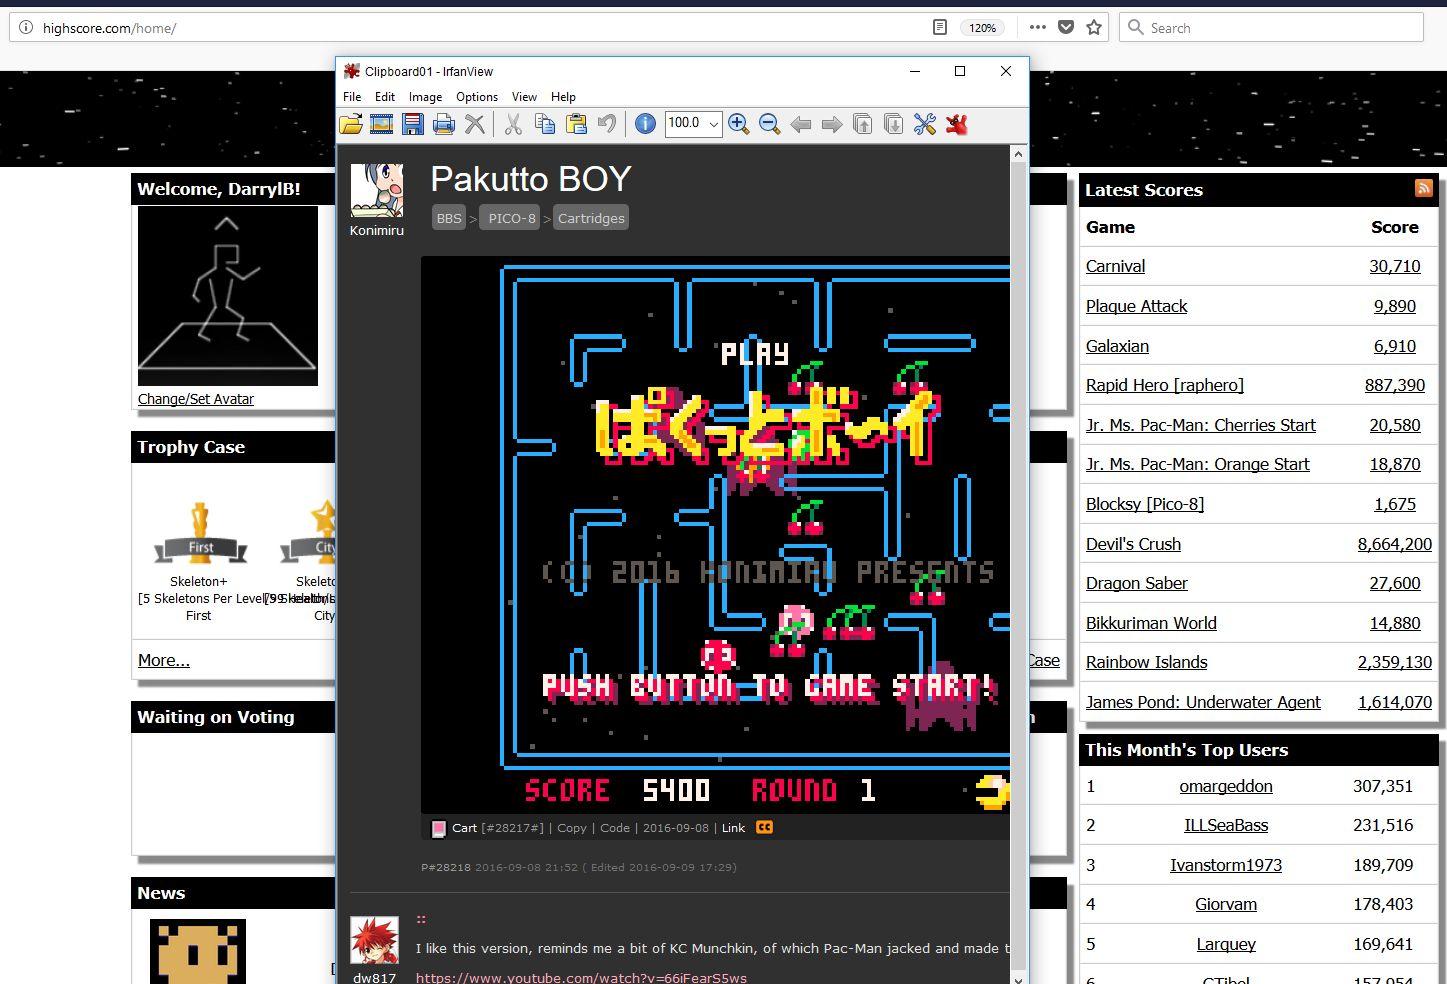 Pakutto BOY [PICO-8] 5,400 points